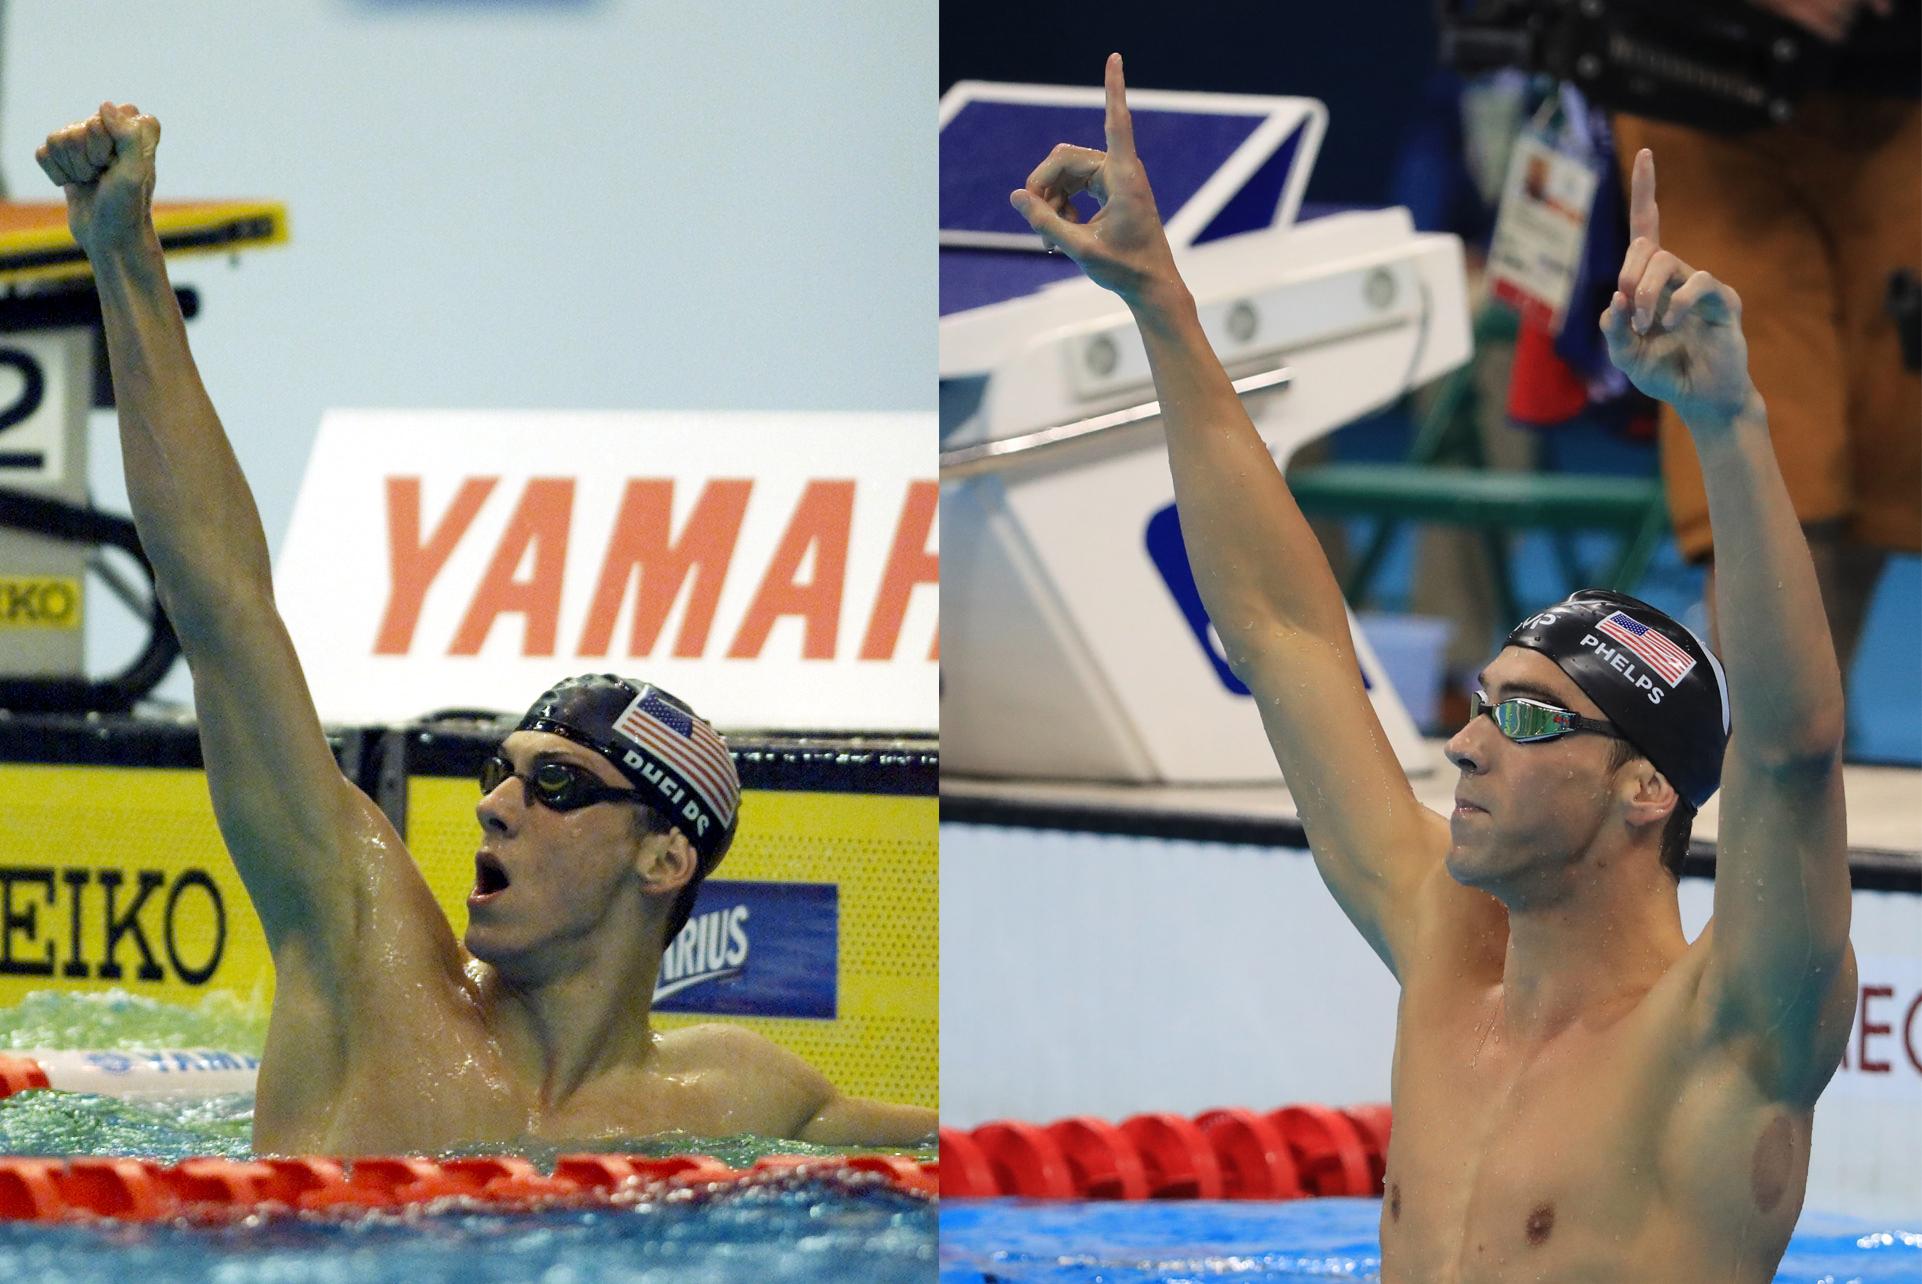 Michael Phelps celebrating